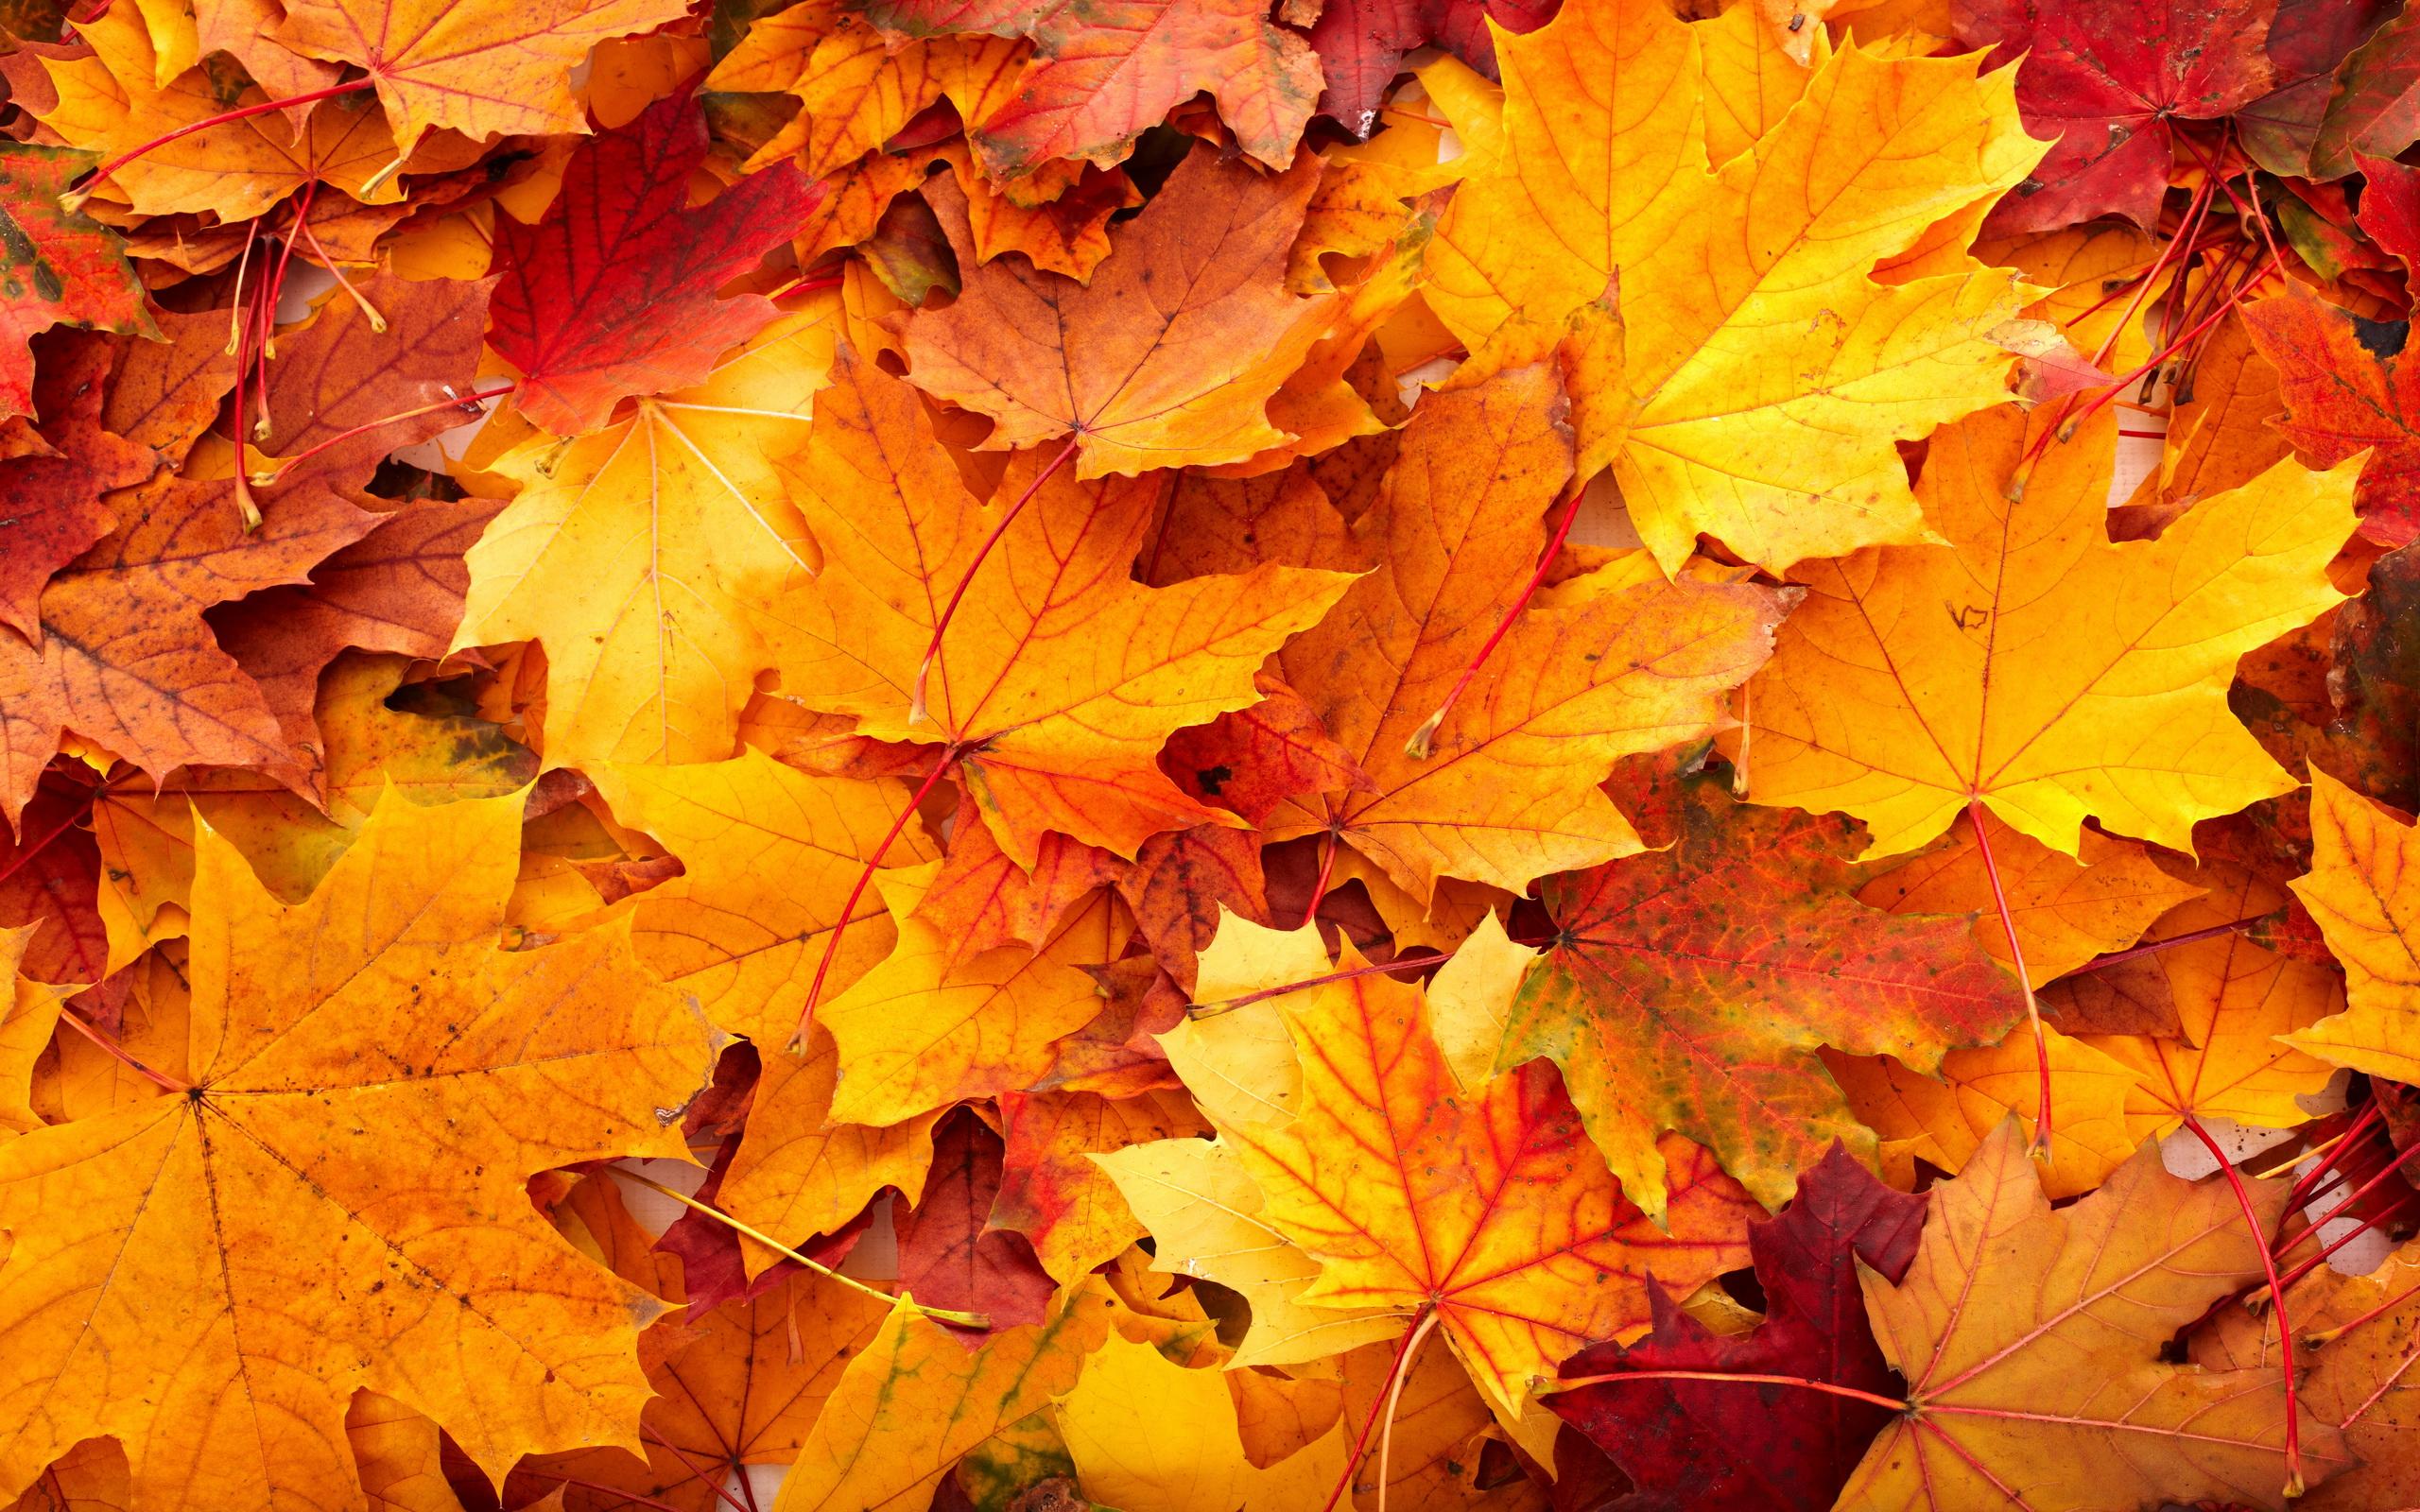 Fall HD Wallpaper  Background Image  2560x1600  ID:437605